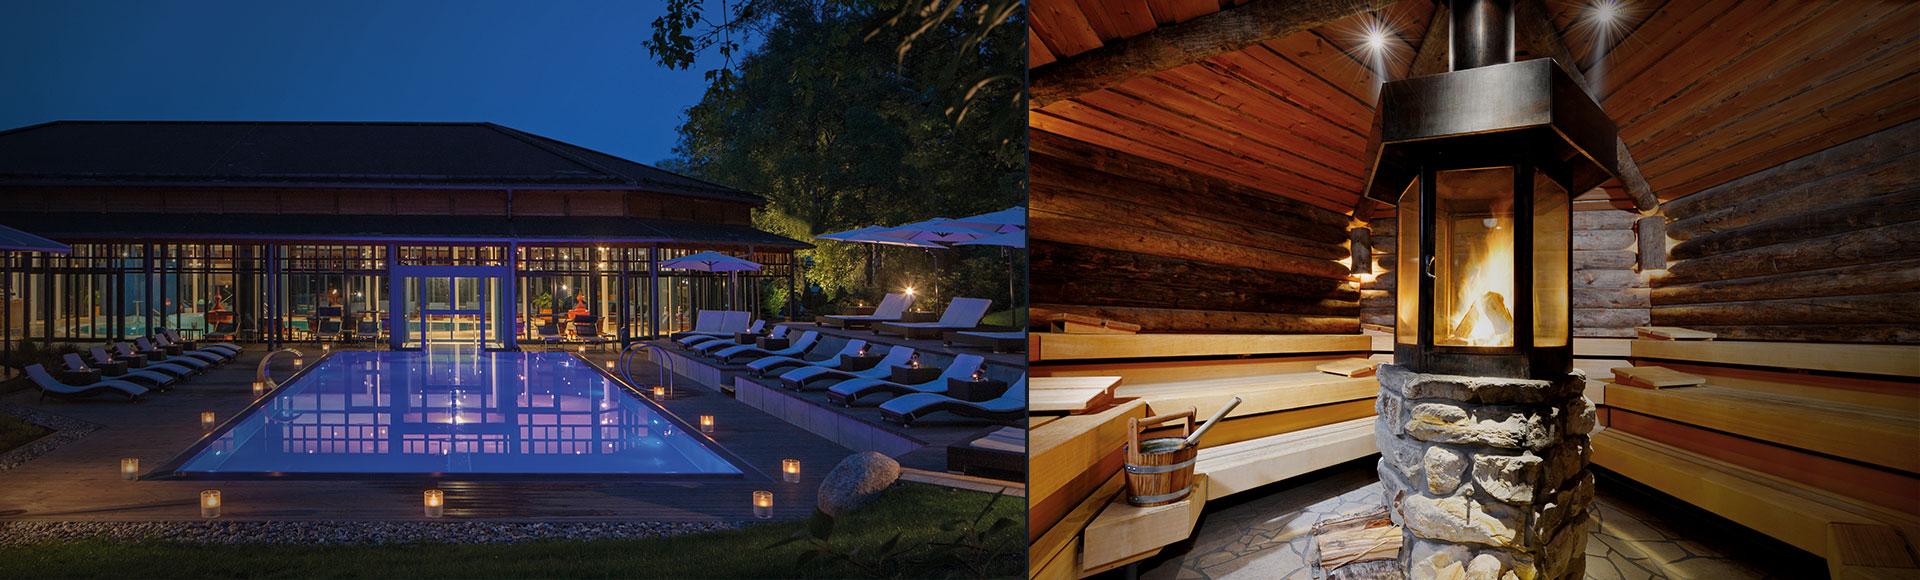 piscines avec vue sur la nature au parkhotel adler. Black Bedroom Furniture Sets. Home Design Ideas